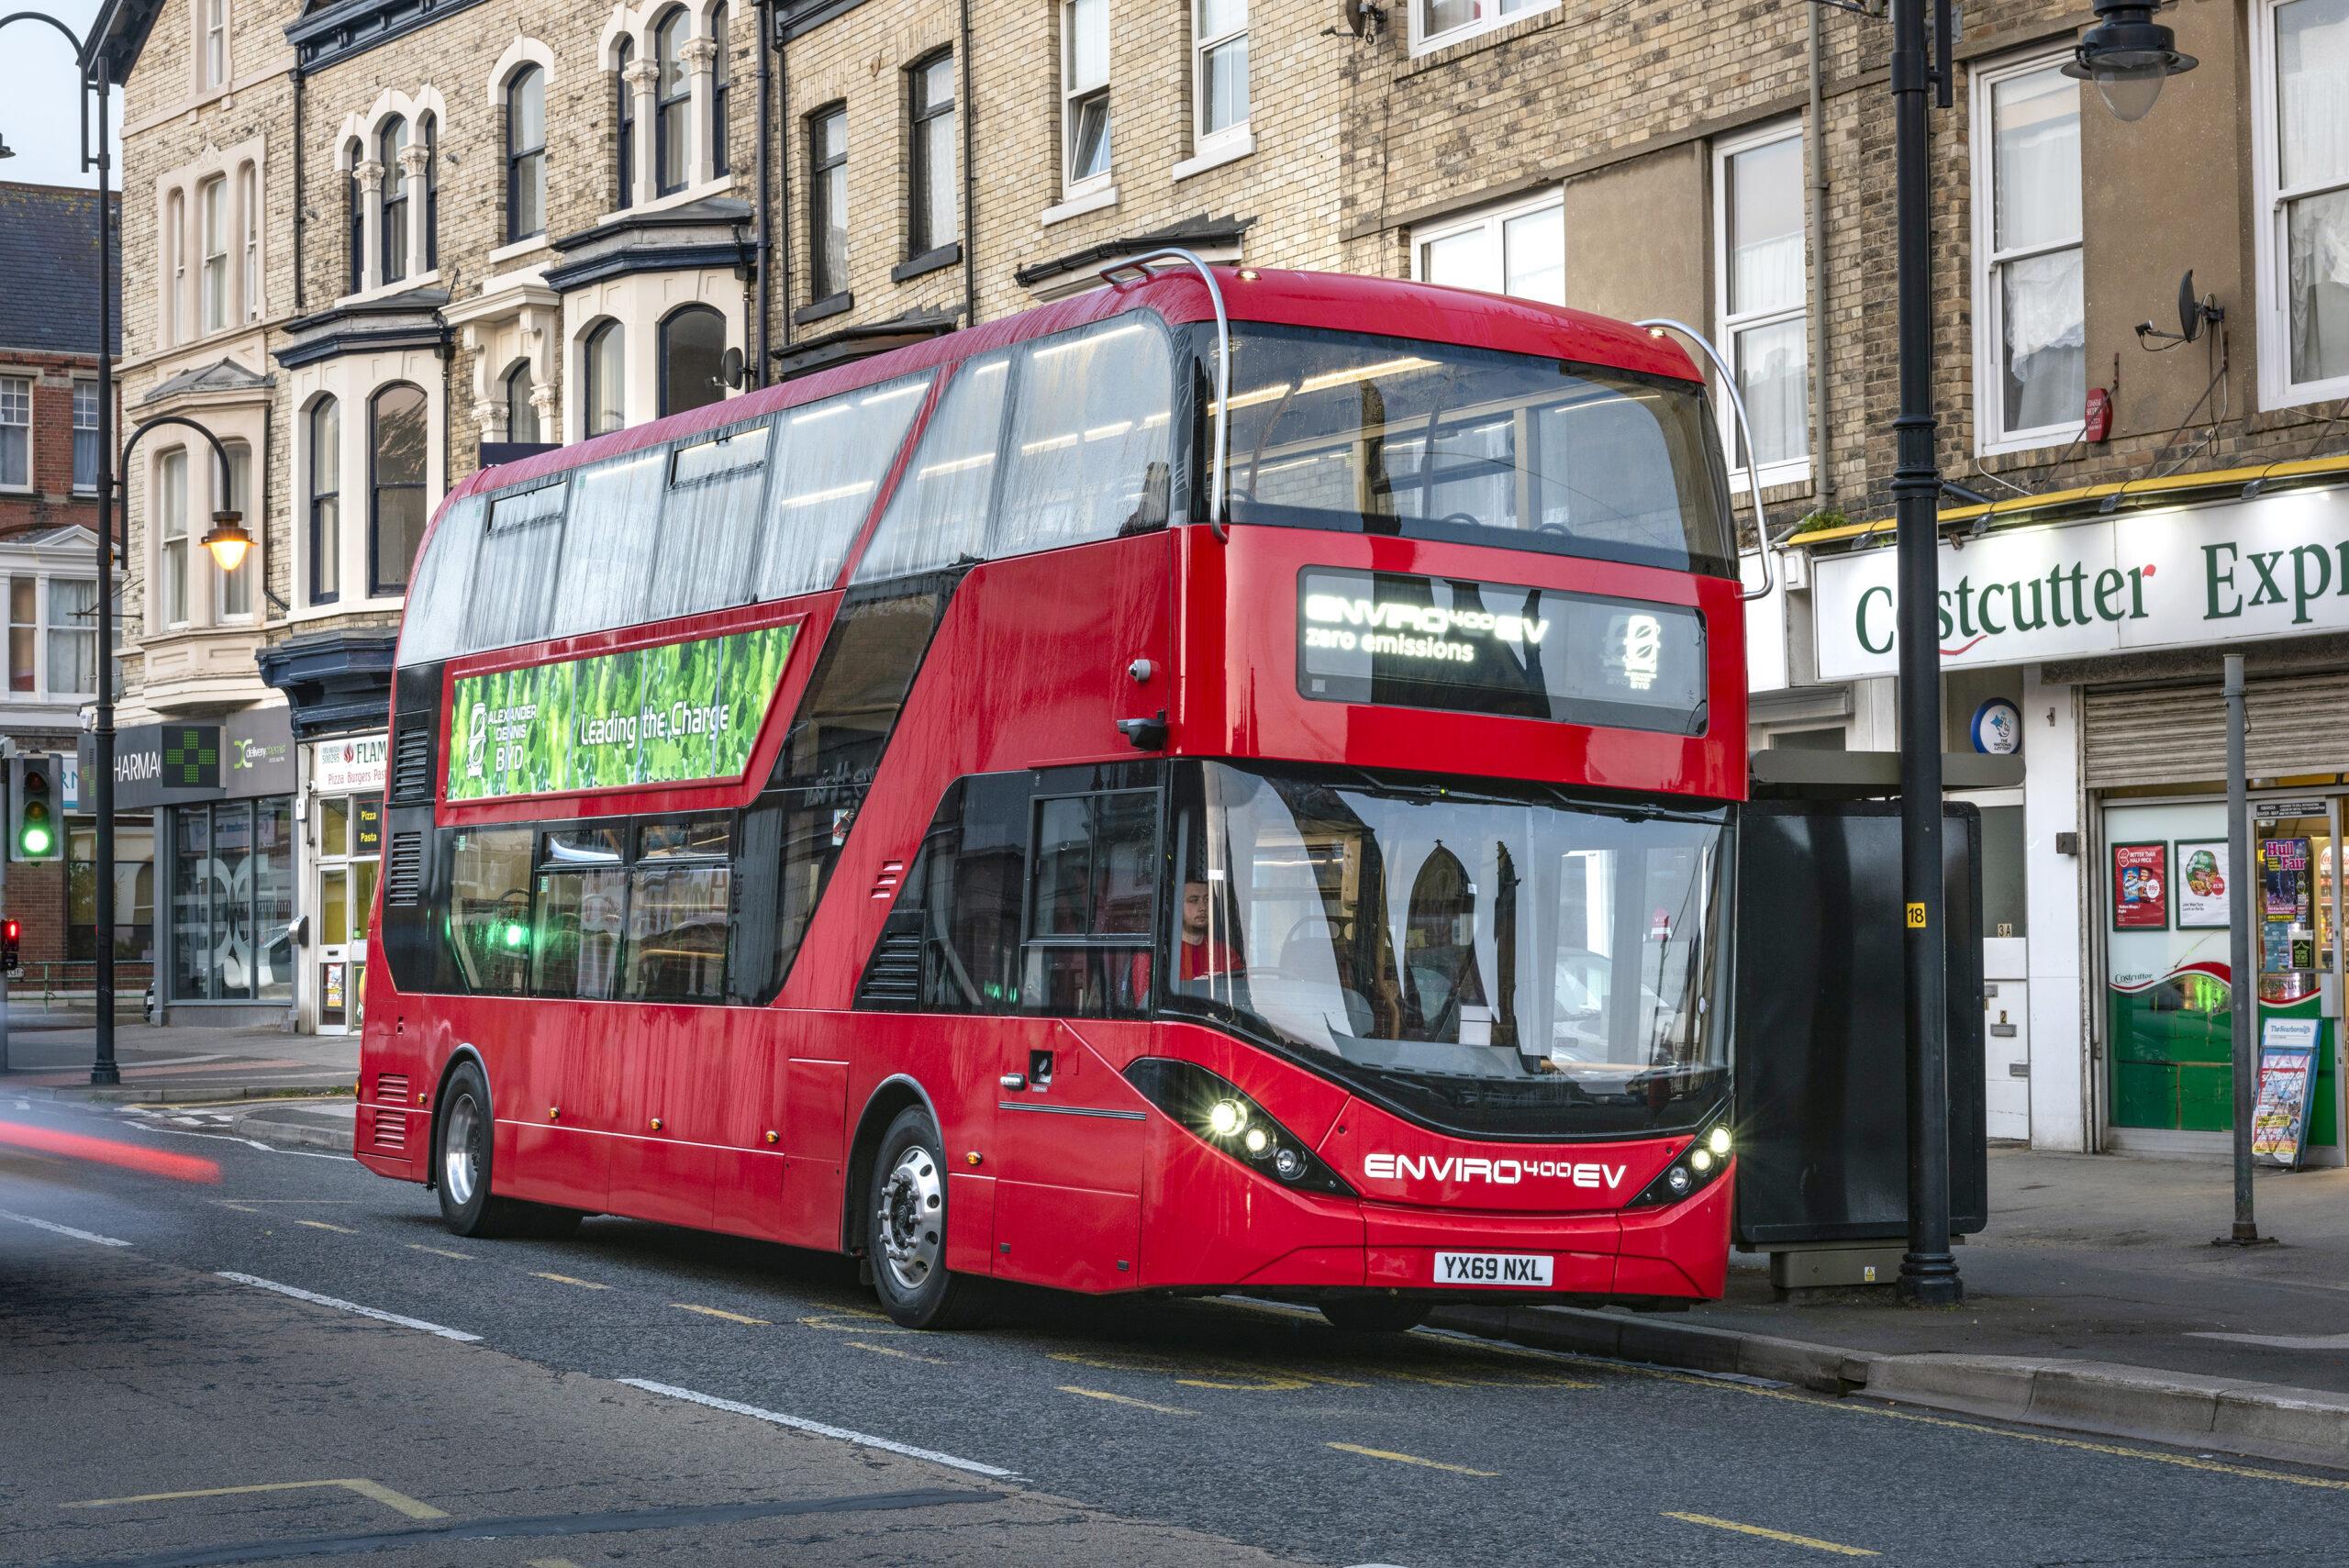 first bus byd adl